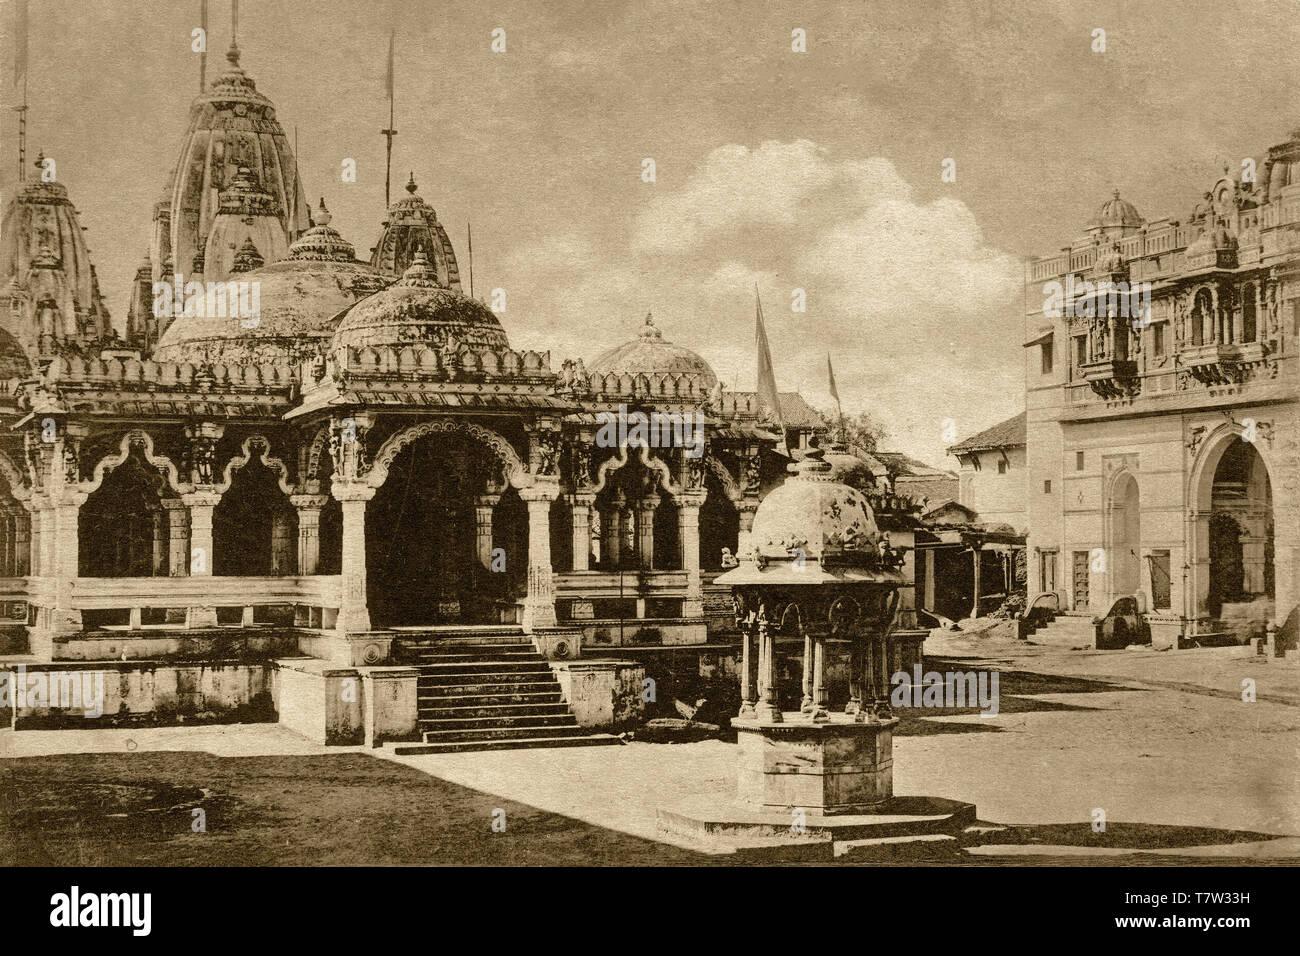 25-Apr-2012-Vintage photo of Swaminarayan temple Kalupur Ahmedabad now UNESCO world heritage city-Gujarat INDIA - Stock Image